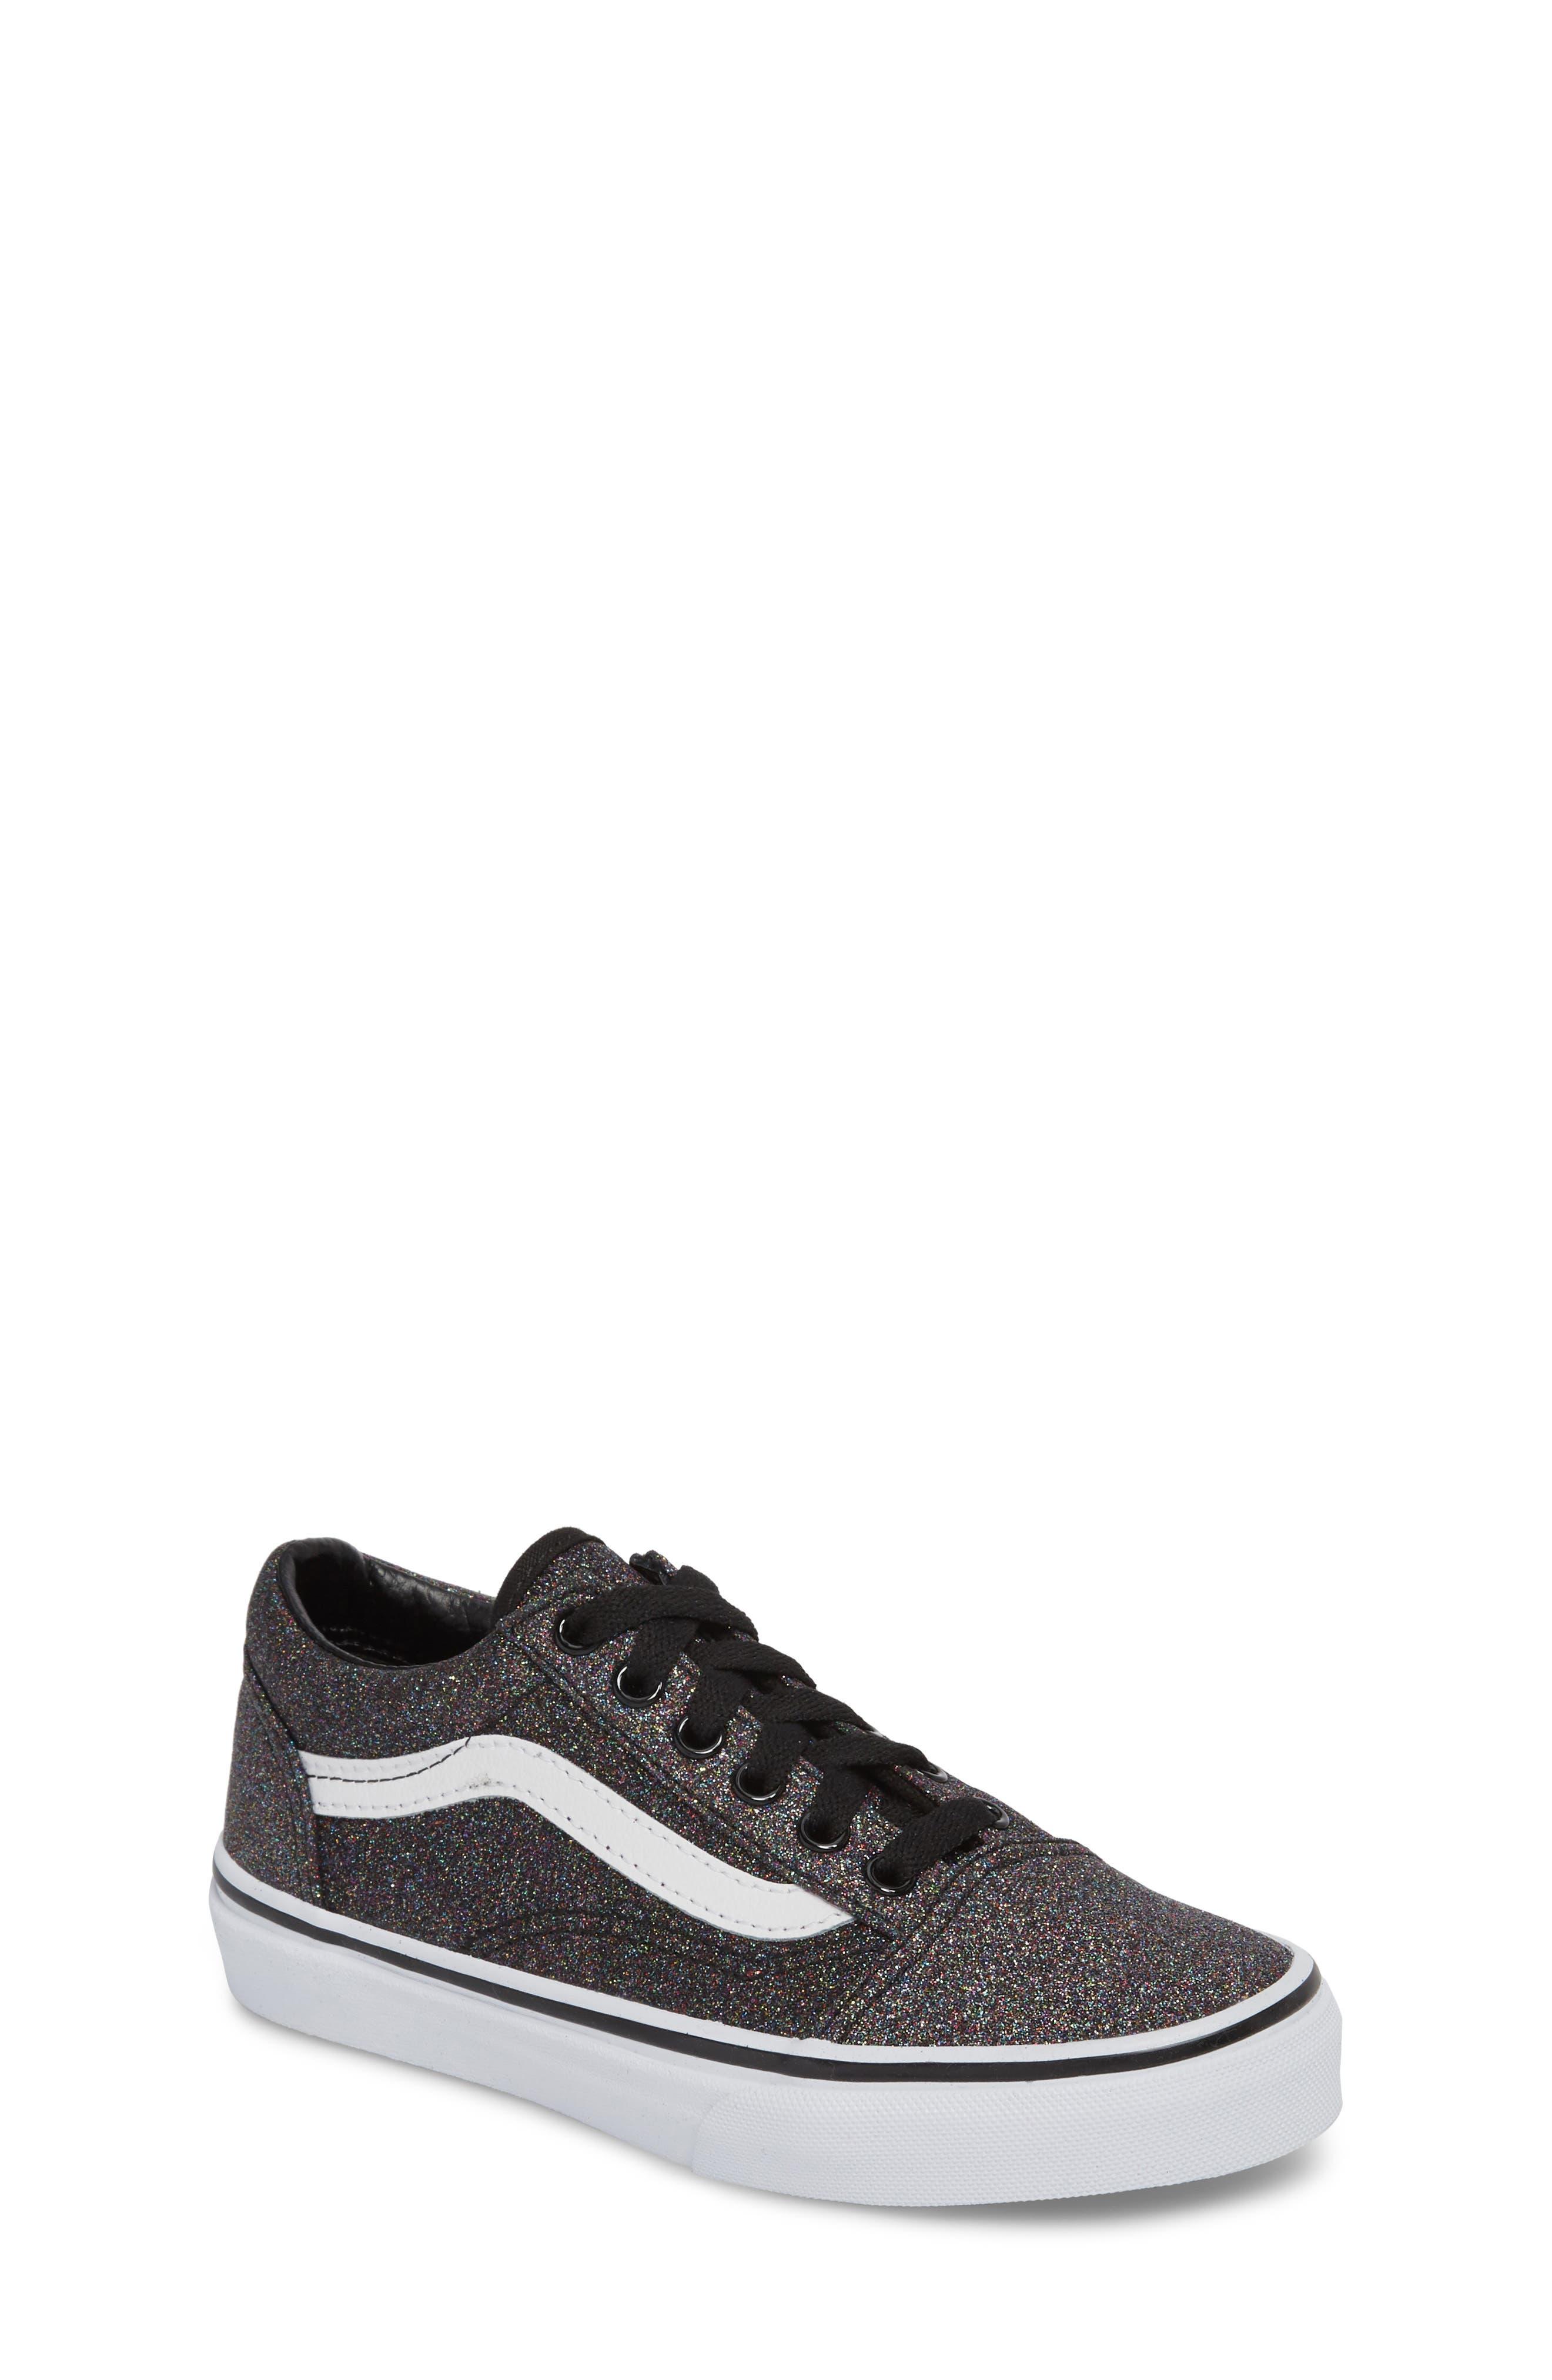 Toddler Girls Vans Old Skool Sneaker Size 12 M  Black